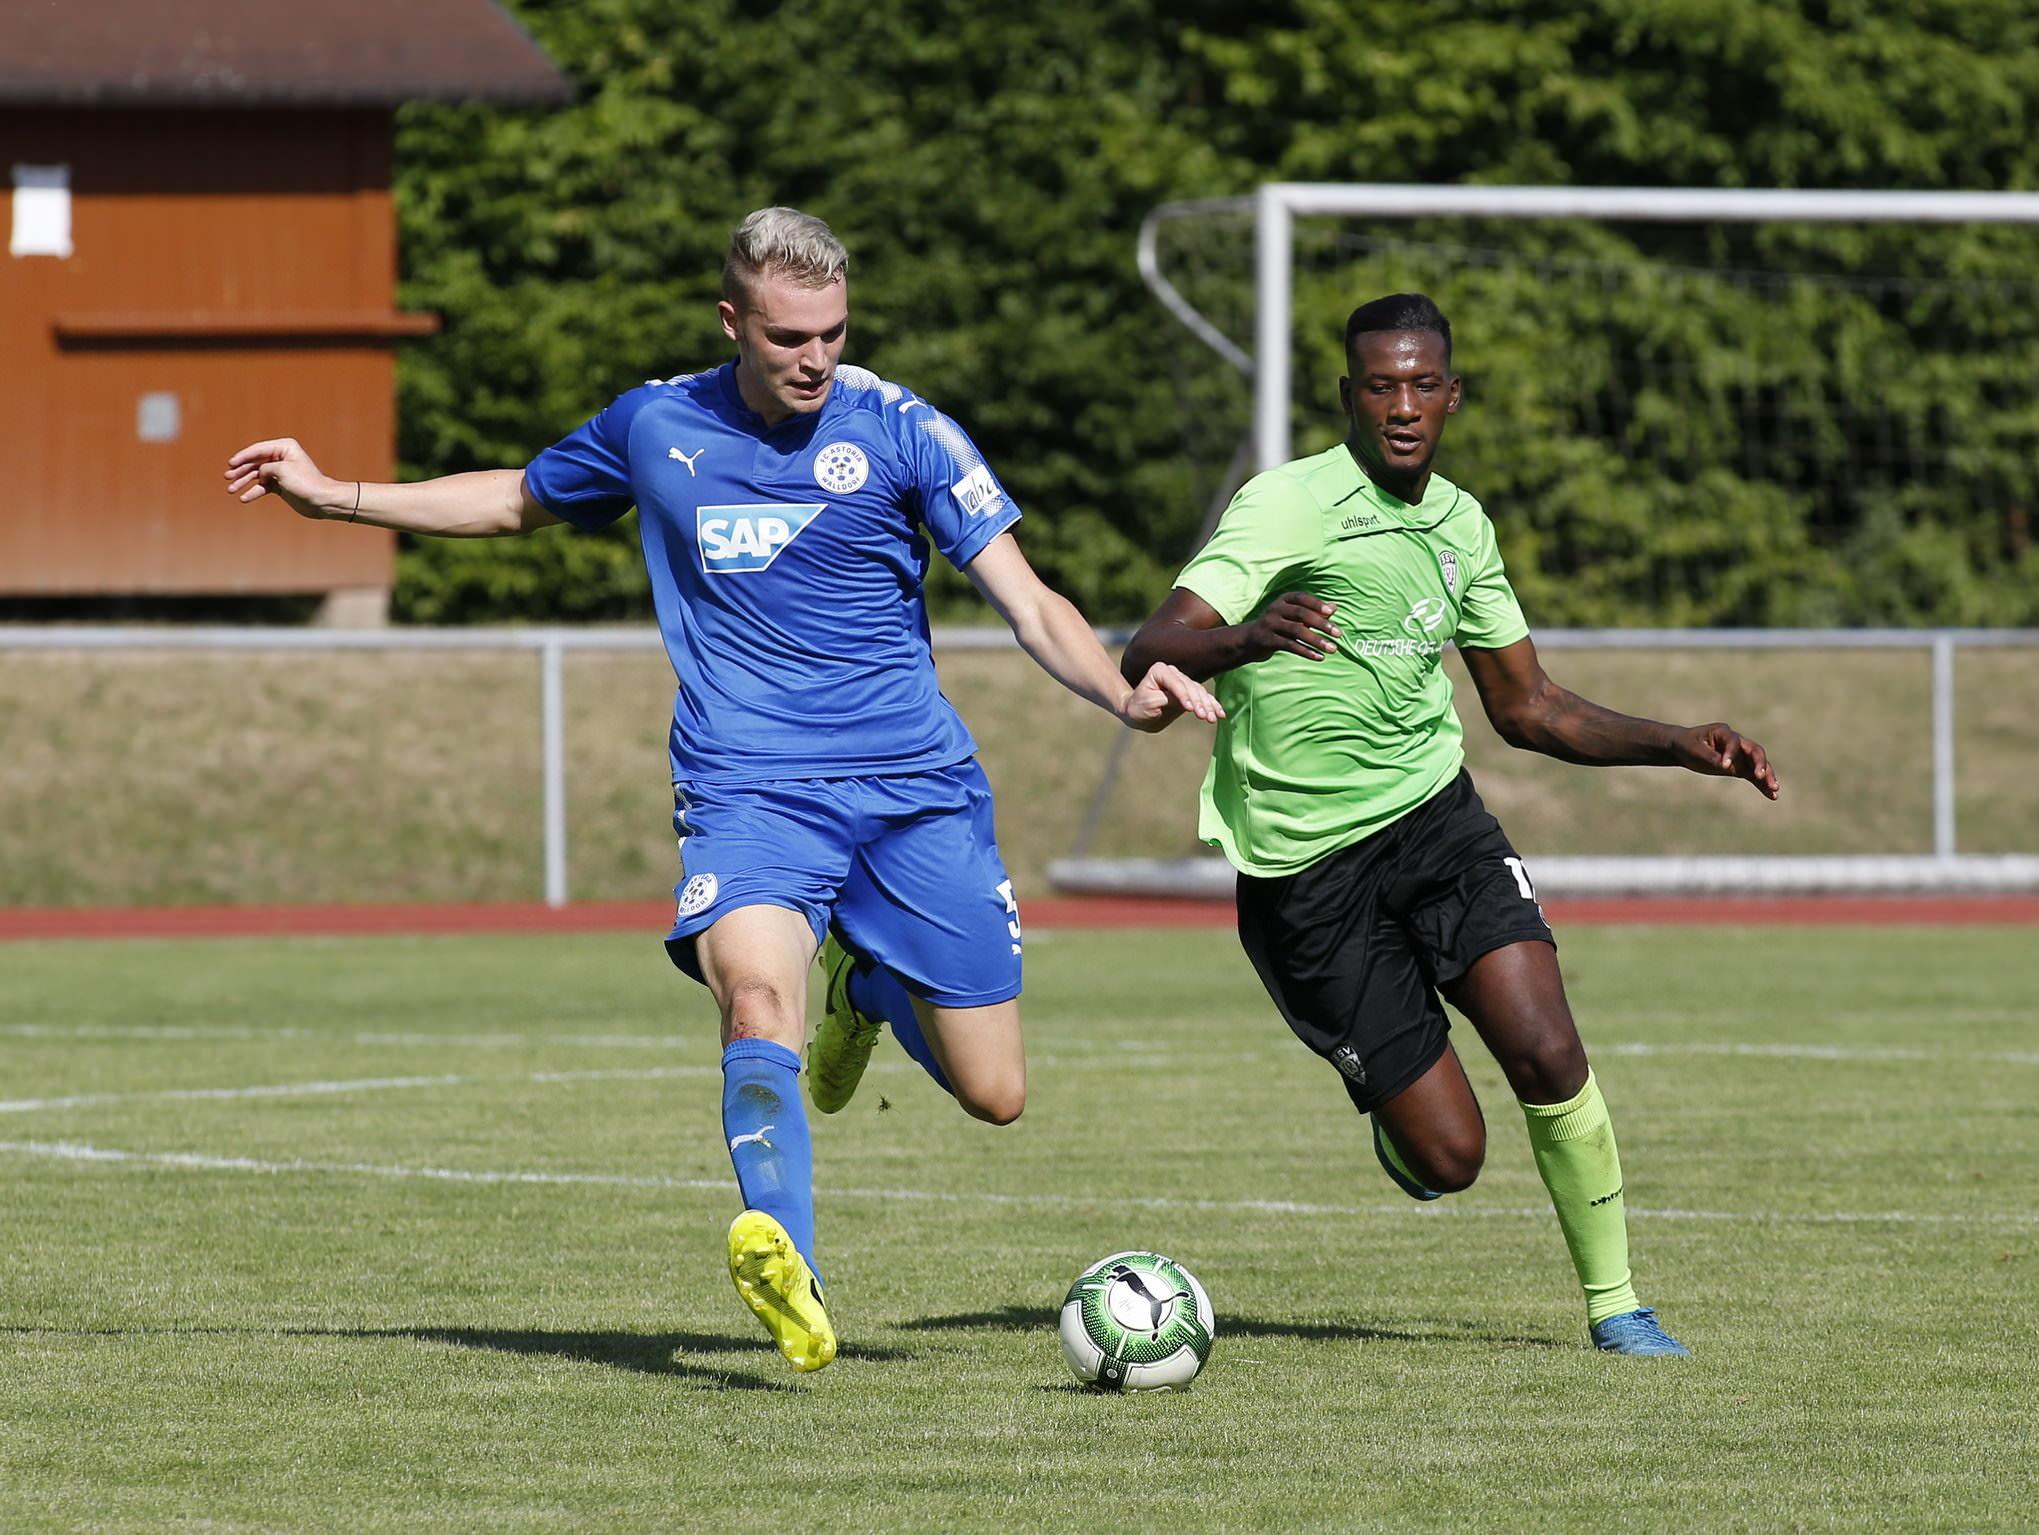 Muehlhausen. Fussball FCA Walldorf gegen SSV Reutlingen.FCA Philipp Strompf links. 08.07.2017 - Helmut Pfeifer.